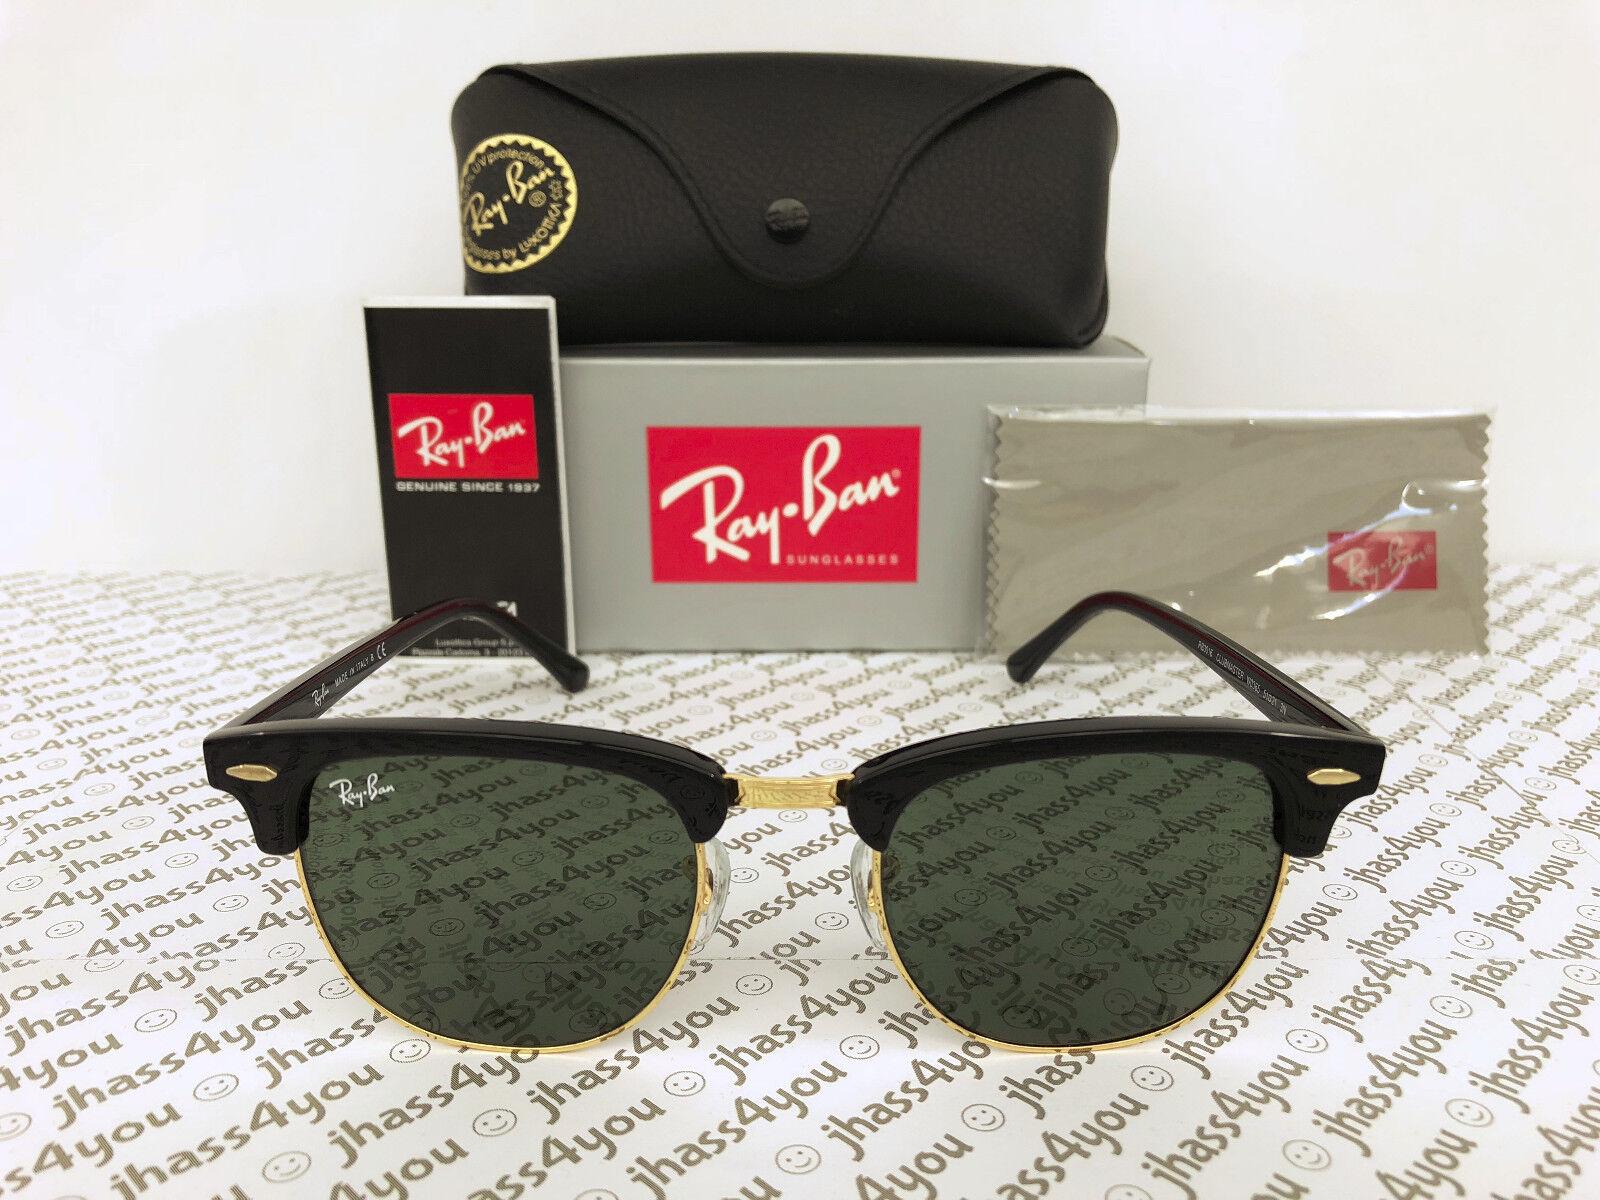 Мужские солнцезащитные очки Ray-Ban Clubmaster Sunglasses RB3016 W0365  Black Frame G-15 Green Lens 51-21mm - 352115214193 - купить на eBay.com  (США) с ... 58a11acc1753e